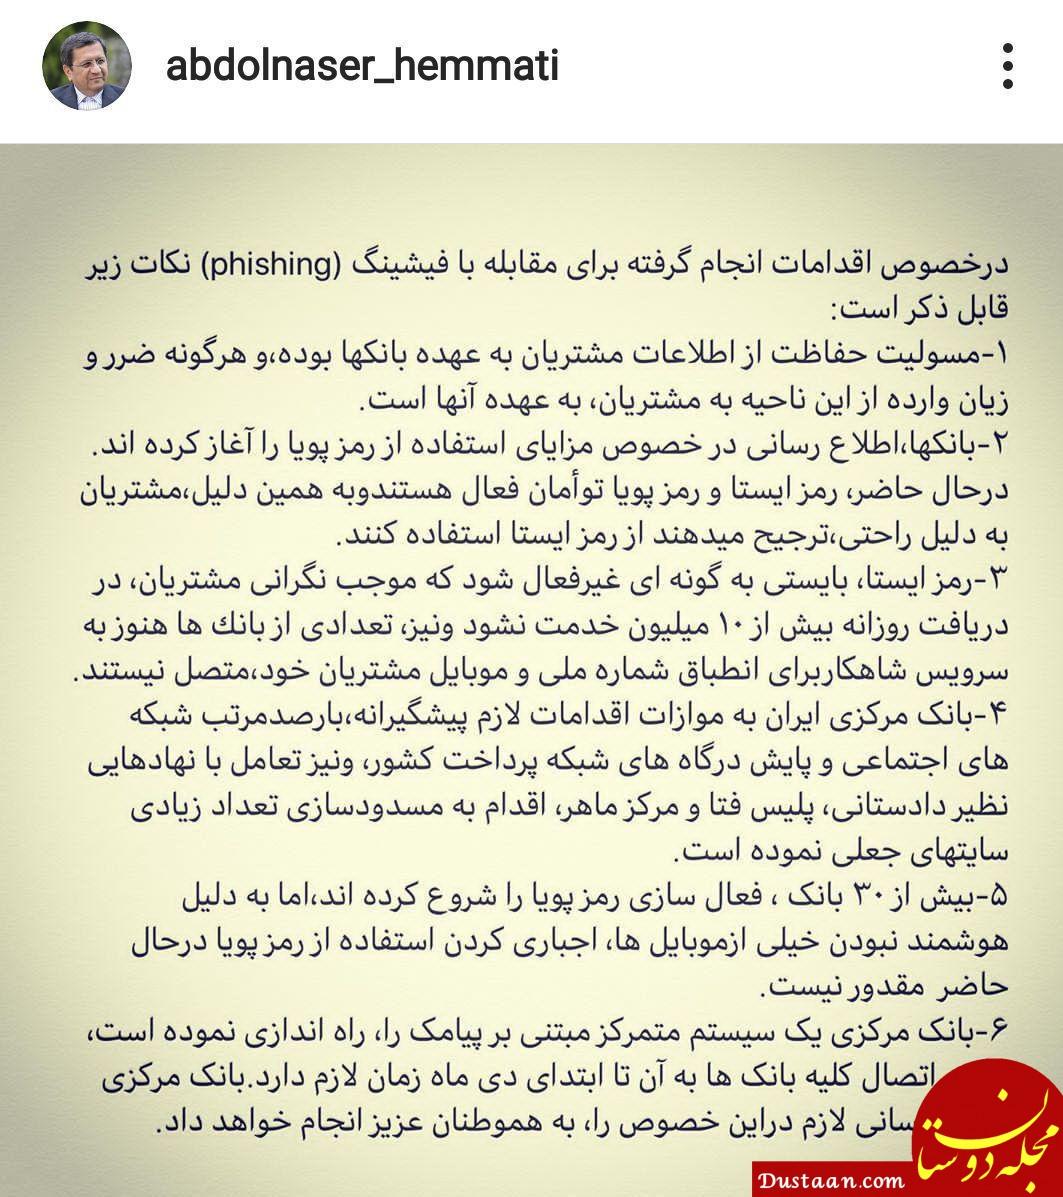 www.dustaan.com همتی: رمز پویا فعلا اجباری نمی شود/ خیلی از موبایلها هوشمند نیستند